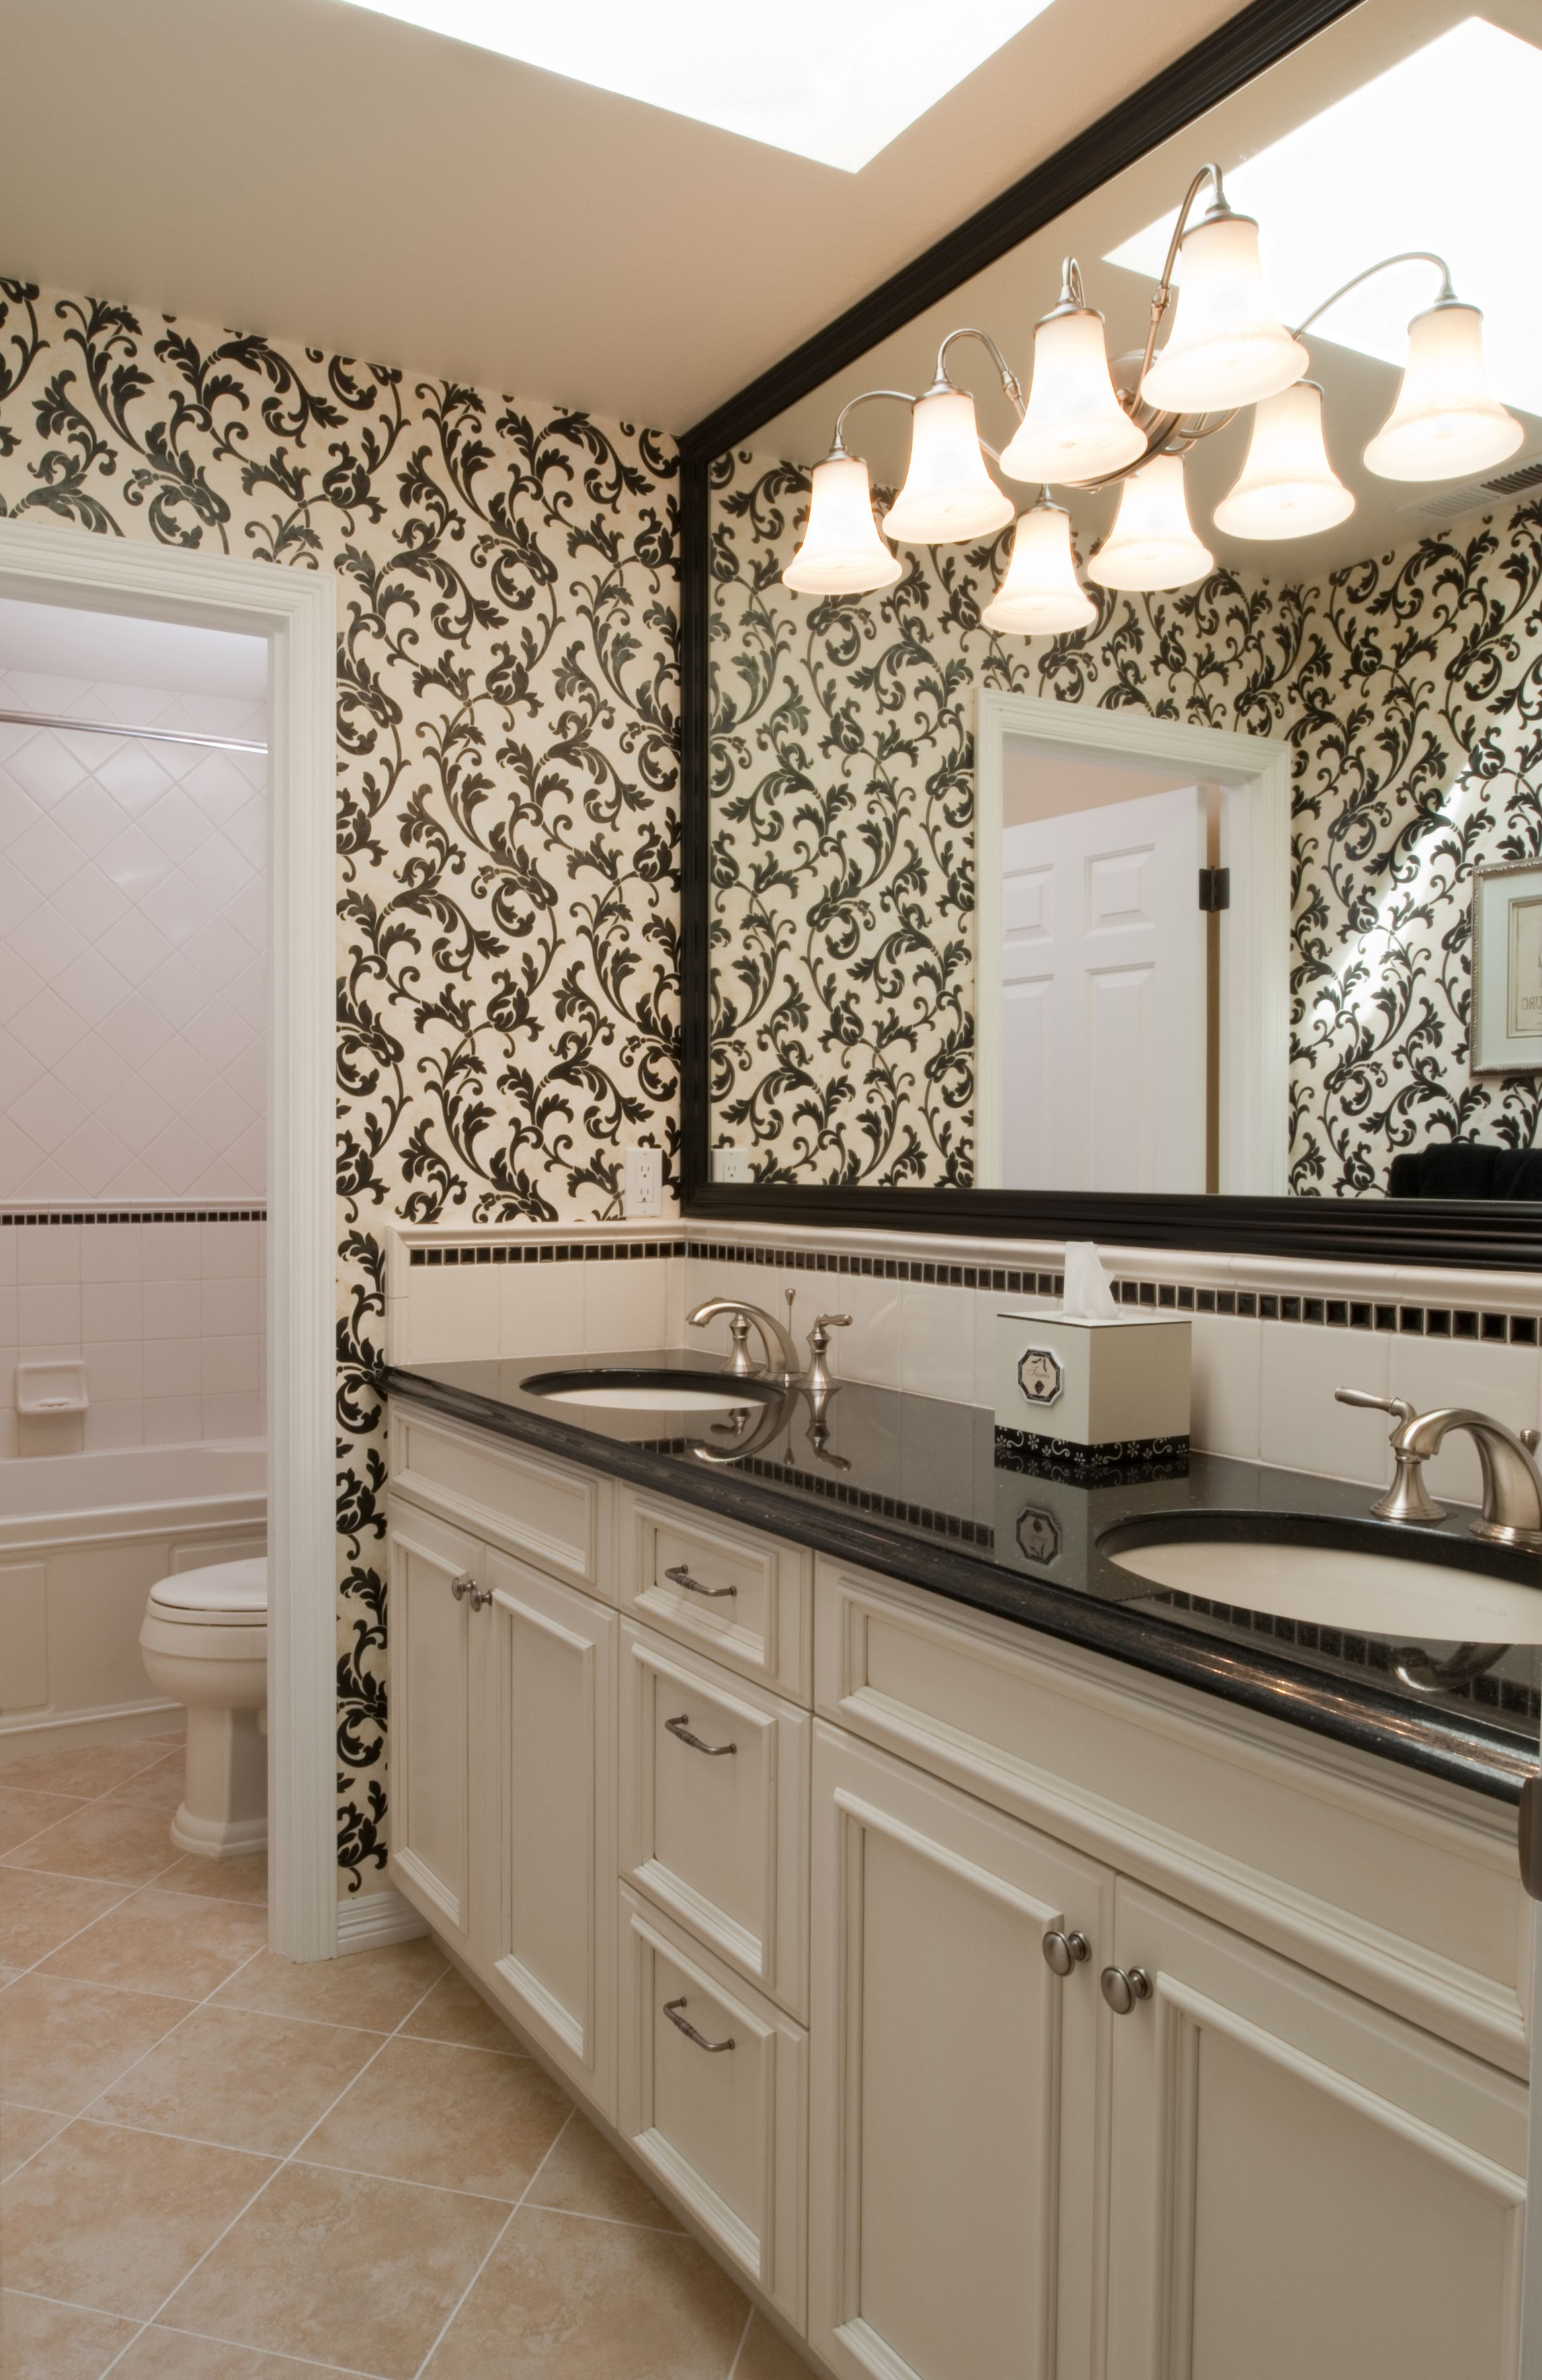 Wallpaper, the ultimate accent. | Black granite ... on Bathroom Ideas With Black Granite Countertops  id=98584